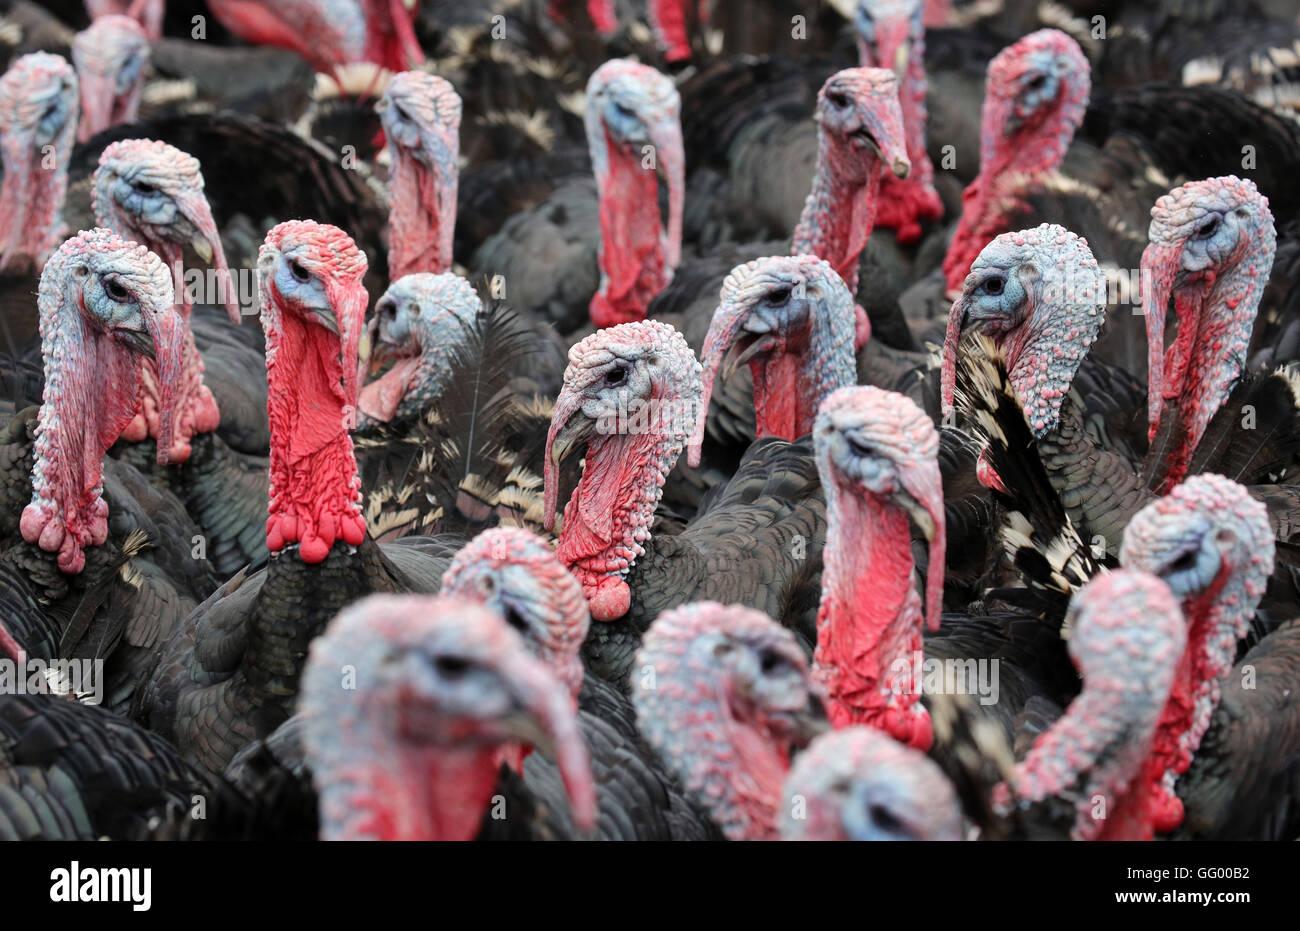 turkeys offensive agai germany - HD1408×791